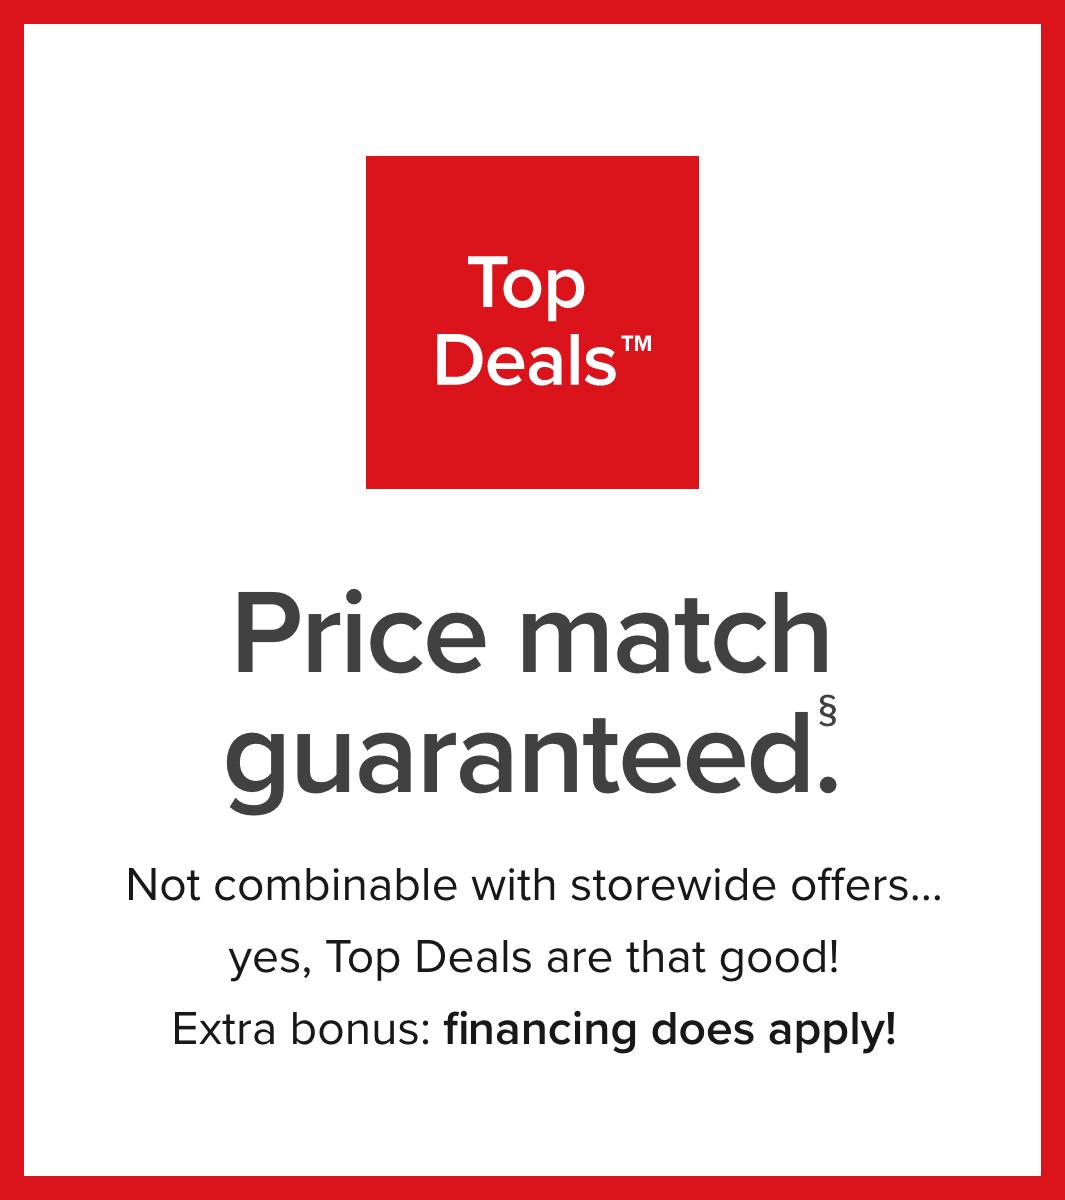 Introducing Top Deals